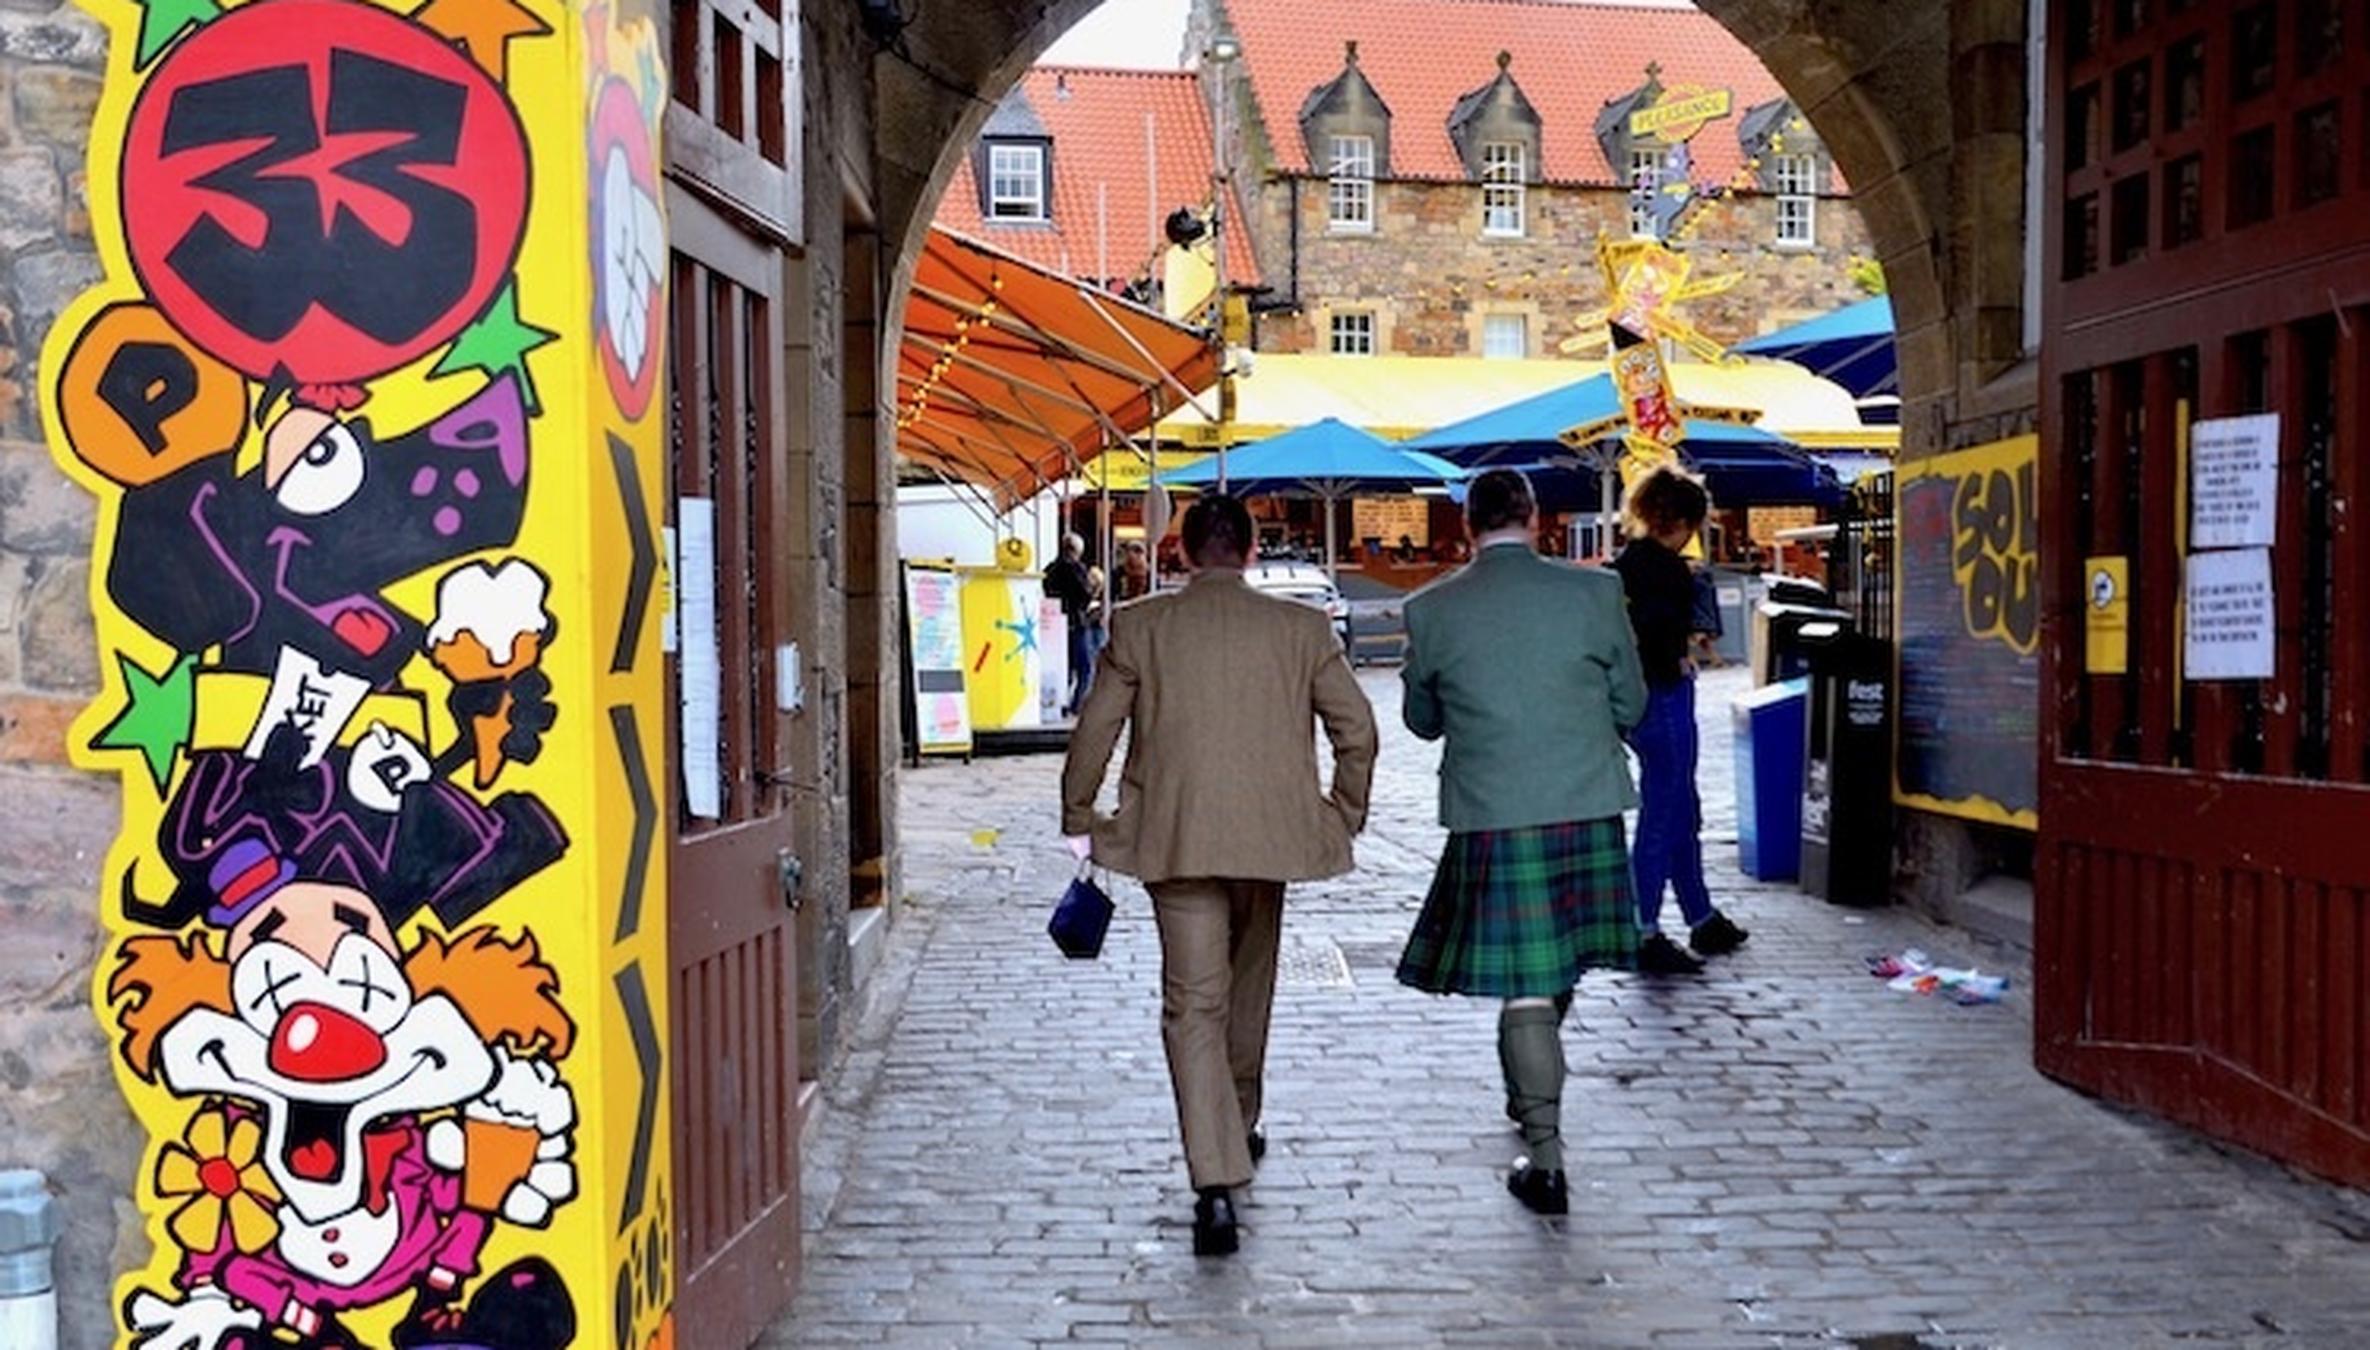 Edinburgh fringe festival box office Builds British Bandsman Your Survival Guide The Edinburgh Fringe Festival